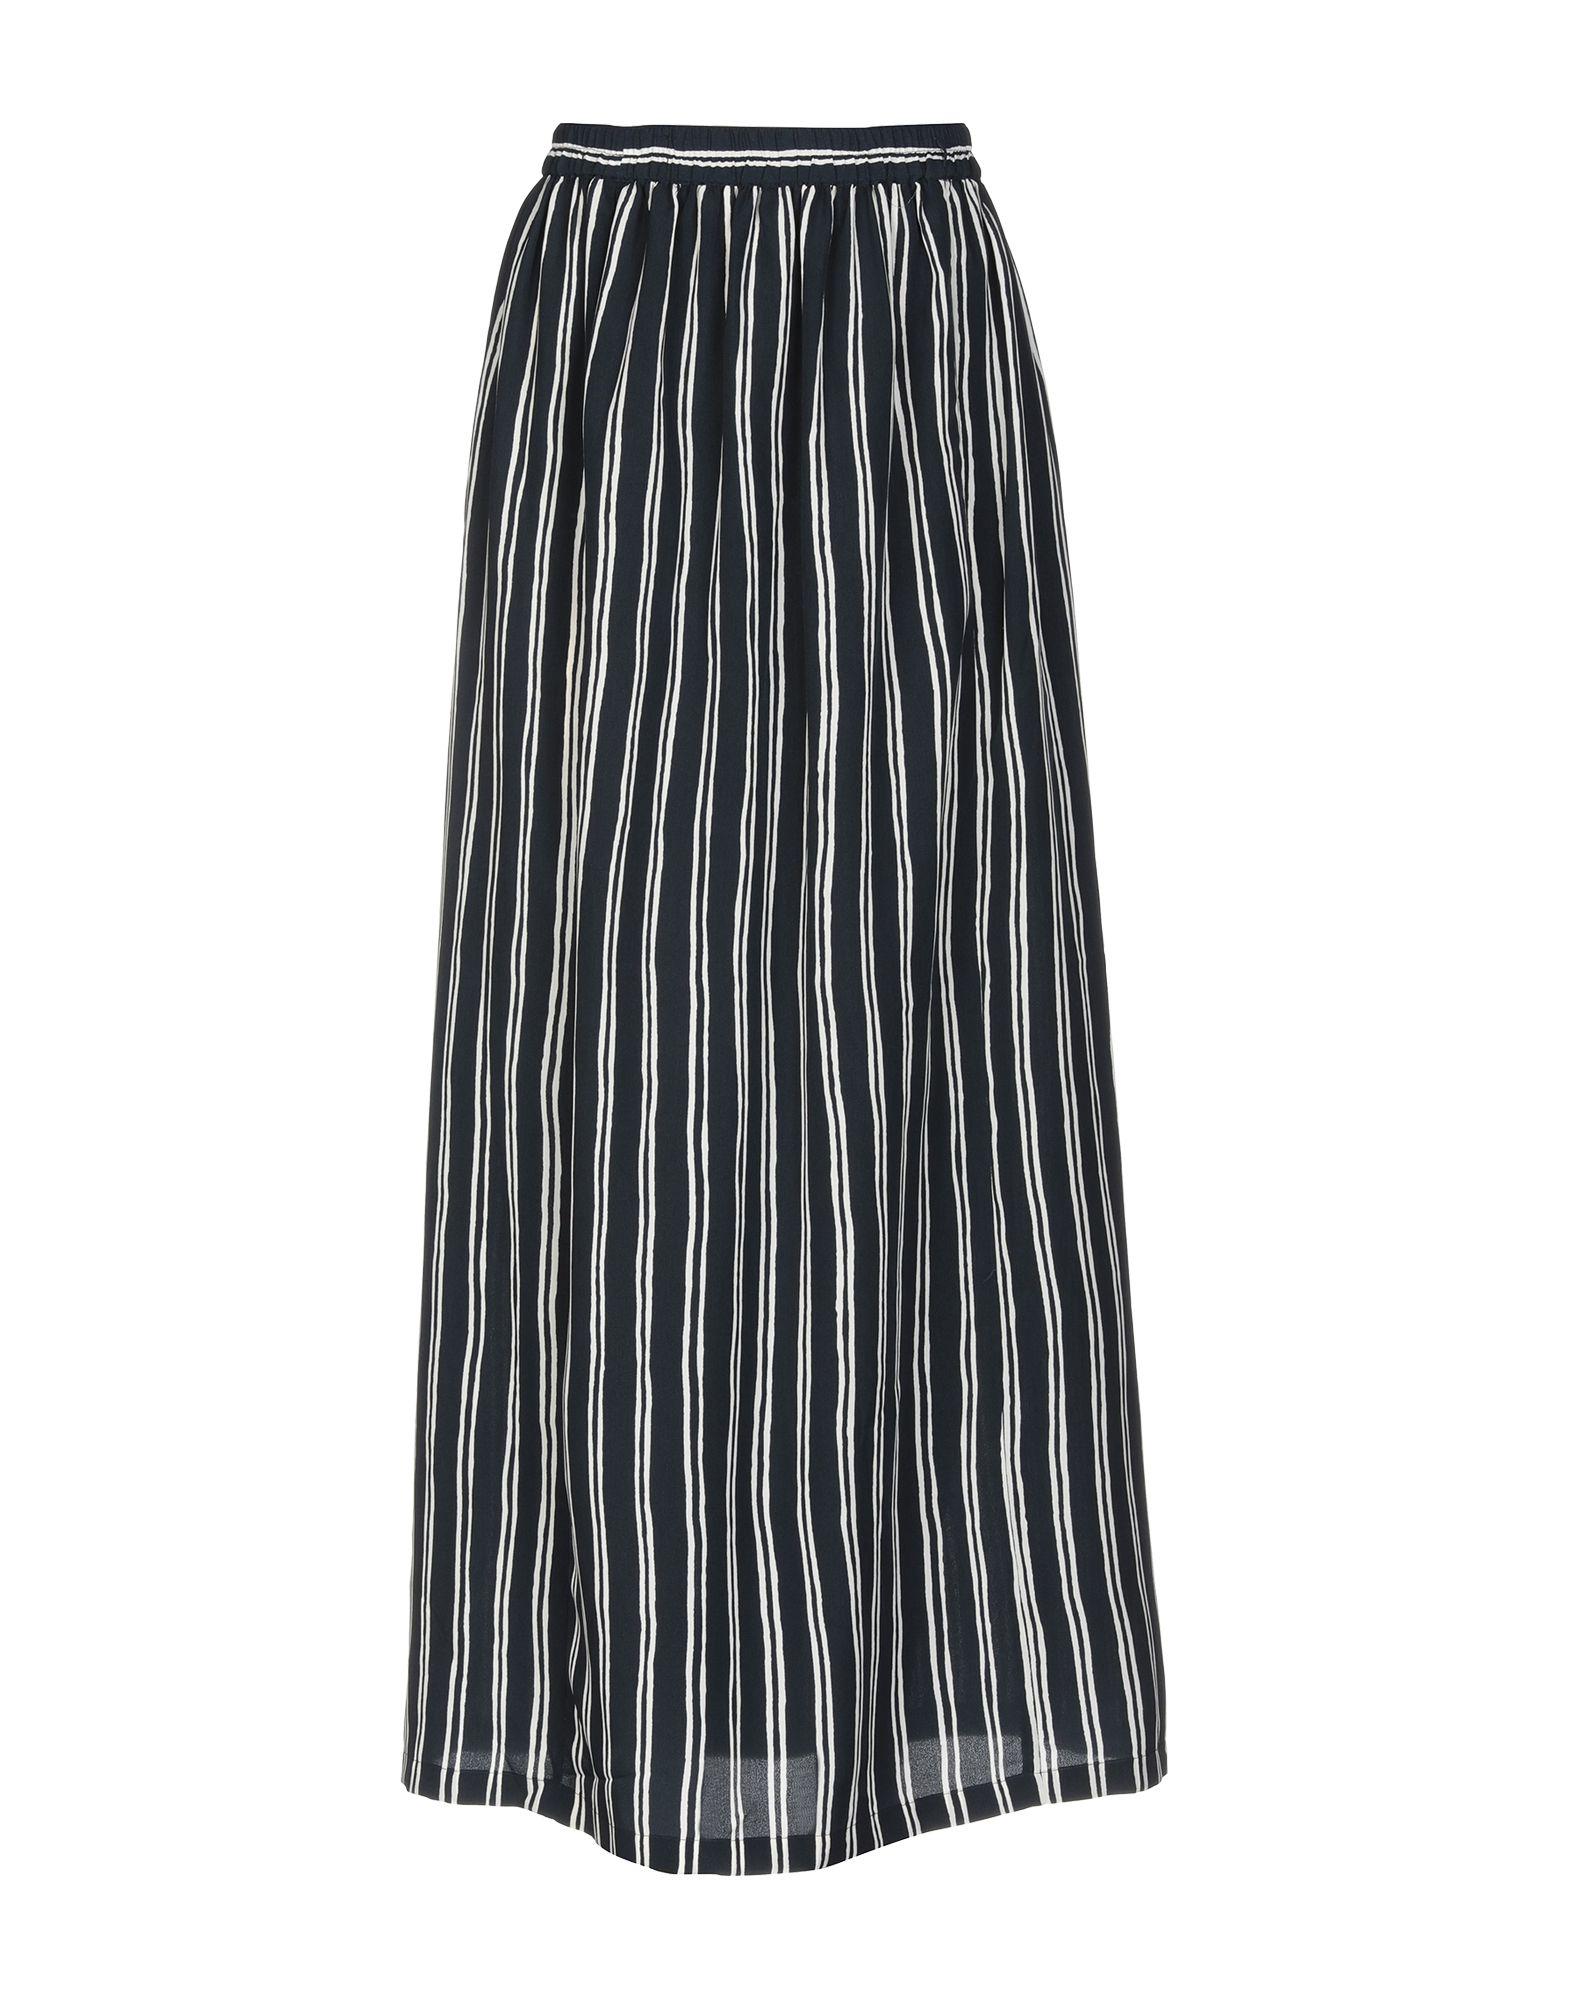 MAISON SCOTCH Длинная юбка